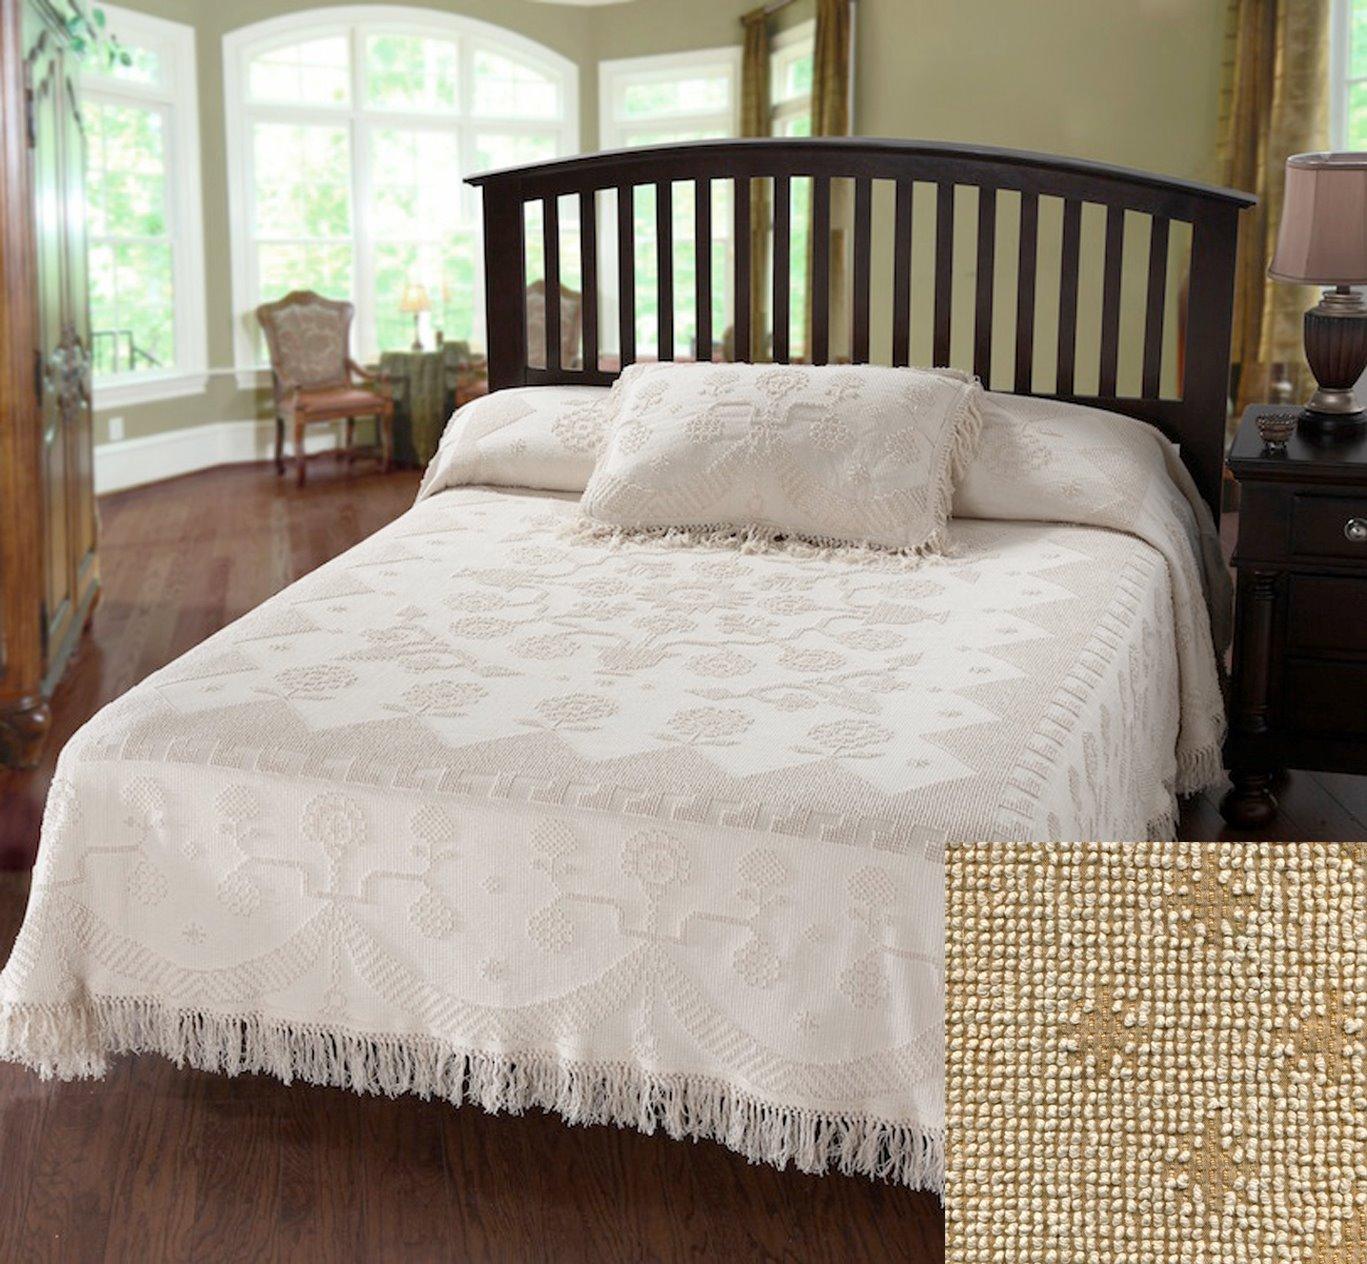 George Washington Bedspread Queen Linen